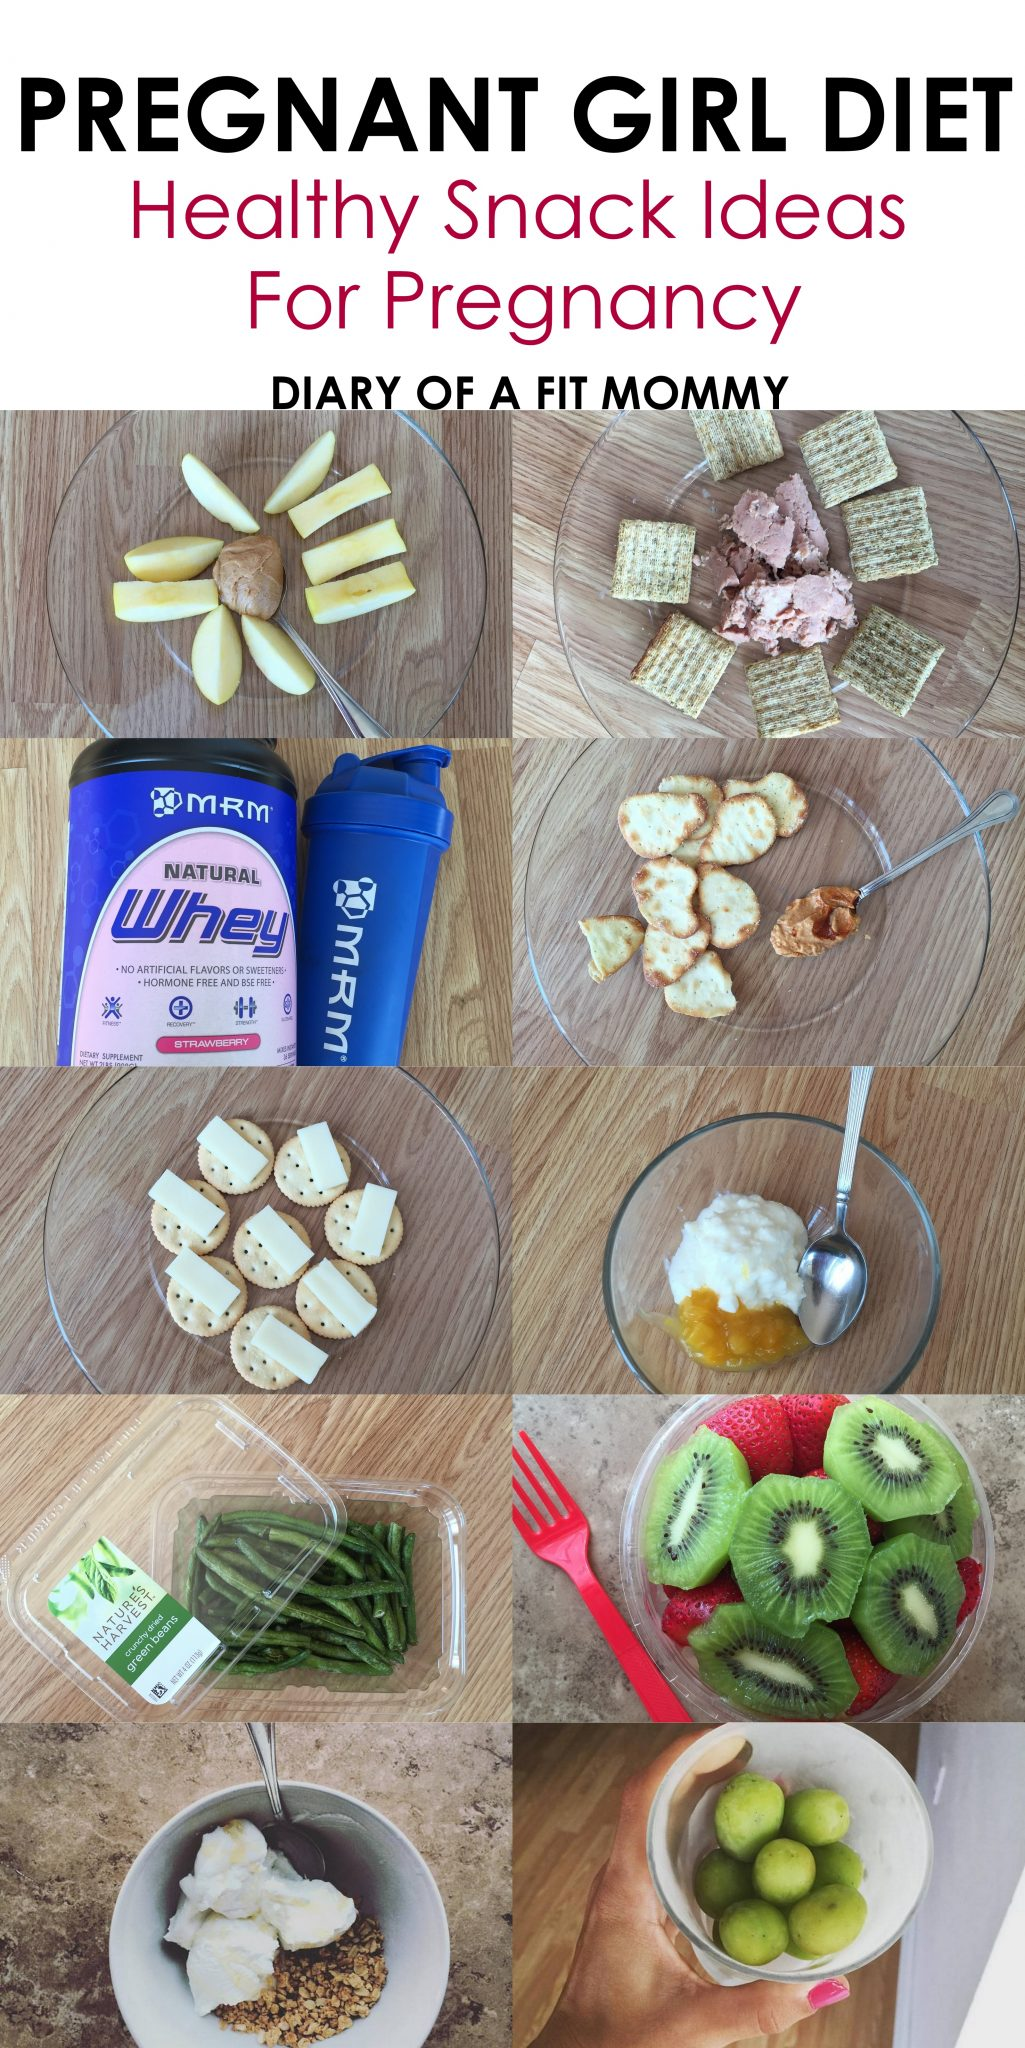 Pregnant Girl Diet Healthy Snacks Ideas For Pregnancy